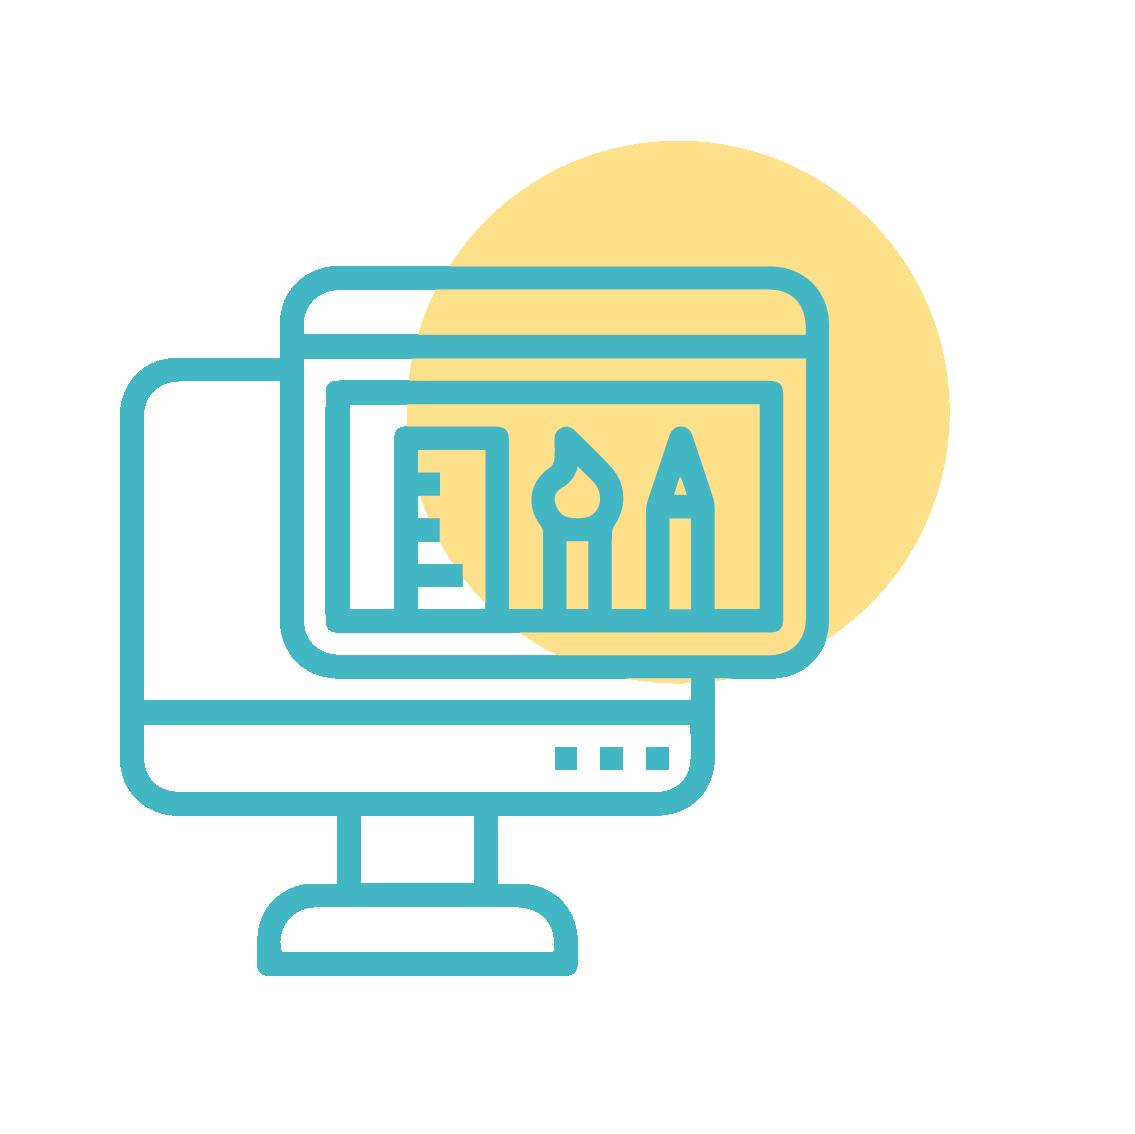 Web design icon illustration